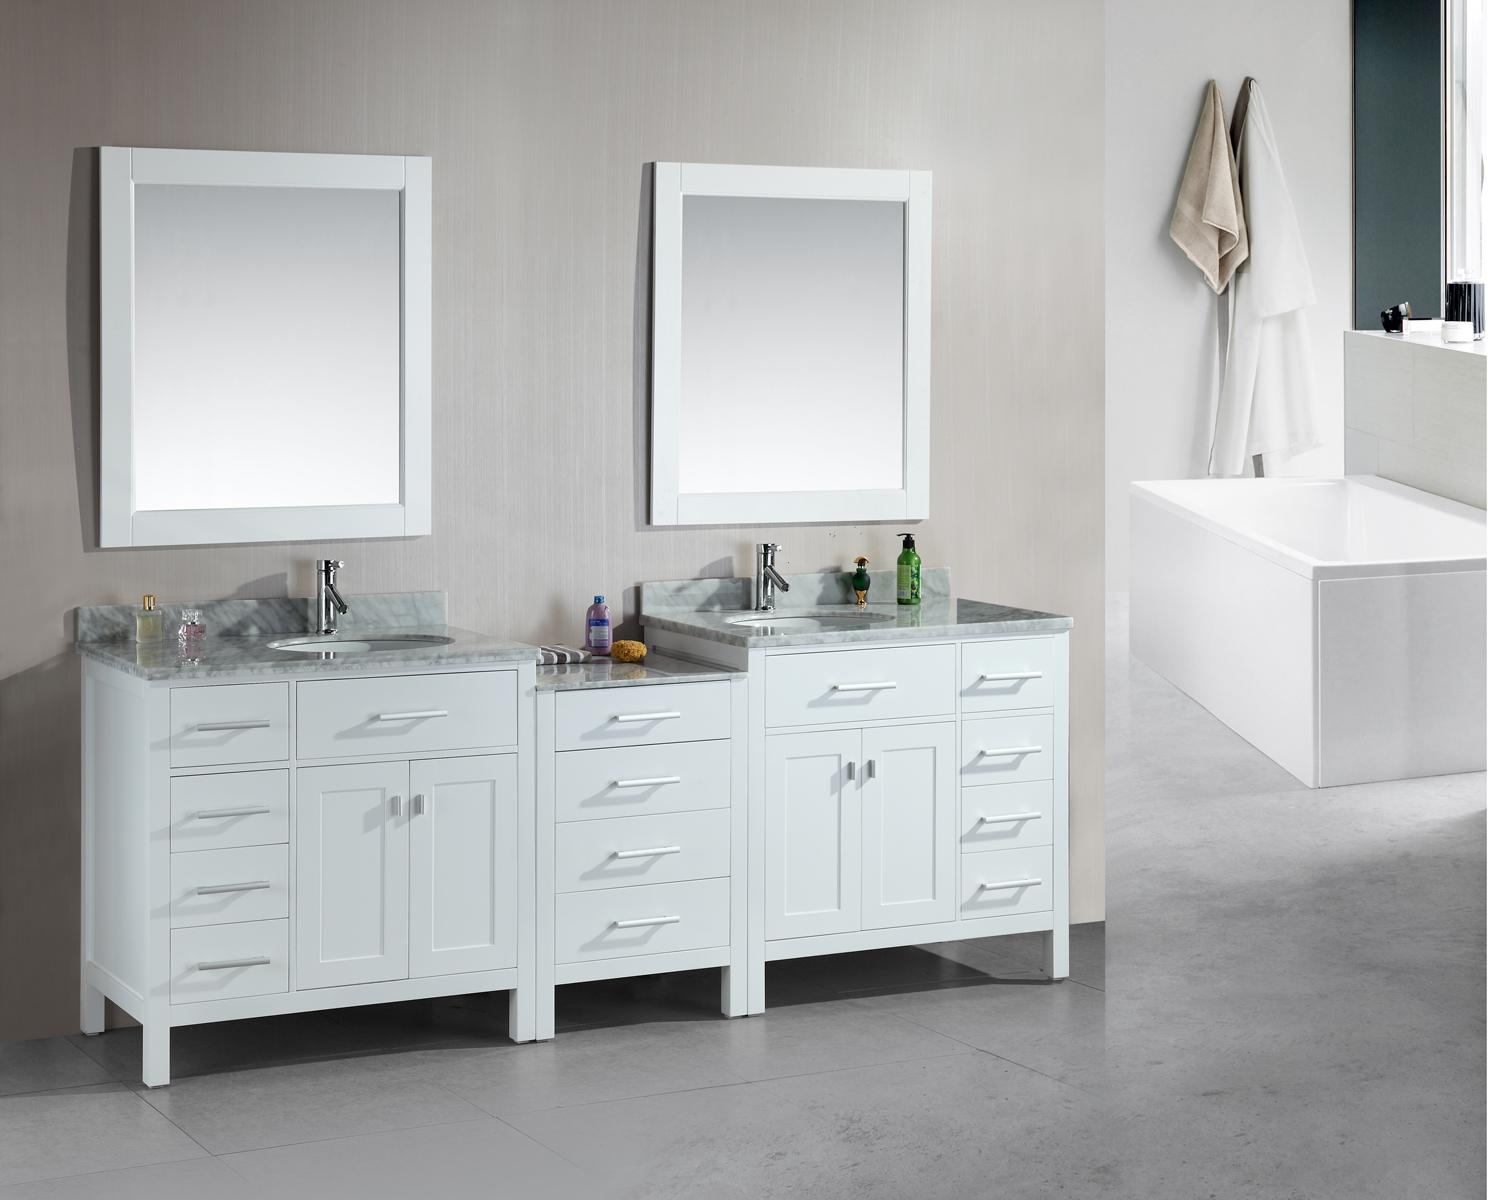 2 Sink Bathroom Vanity #24: Adelina Inch Traditional Old Fashioned Bathroom Vanity Living Room